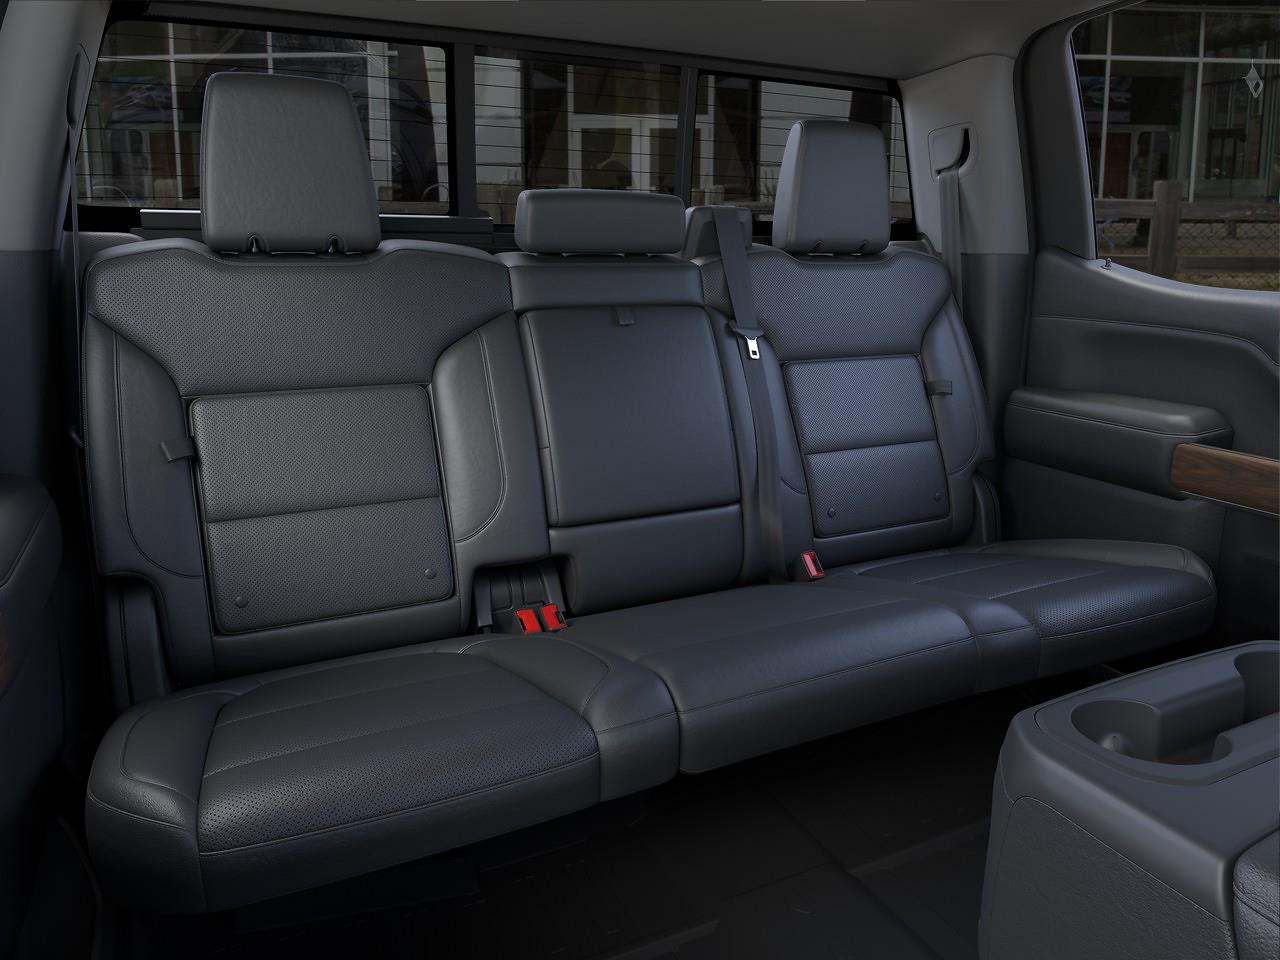 2021 GMC Sierra 1500 Crew Cab 4x4, Pickup #SR1310 - photo 14